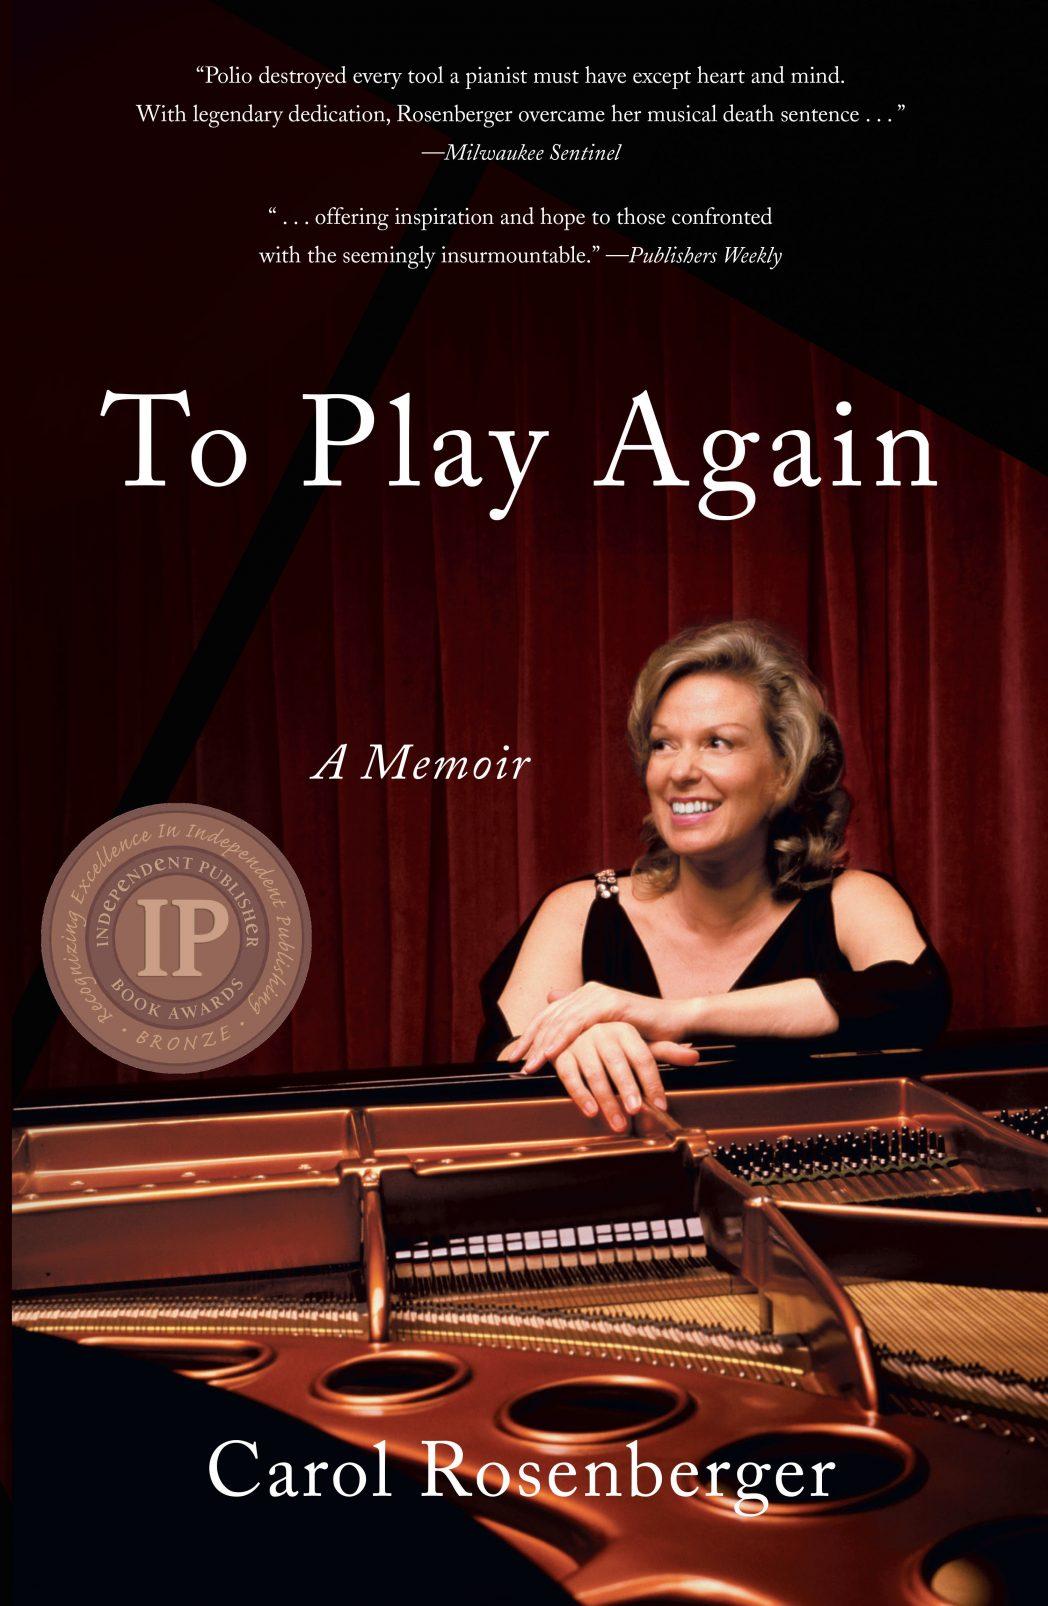 Carol Rosenberger: To Play Again